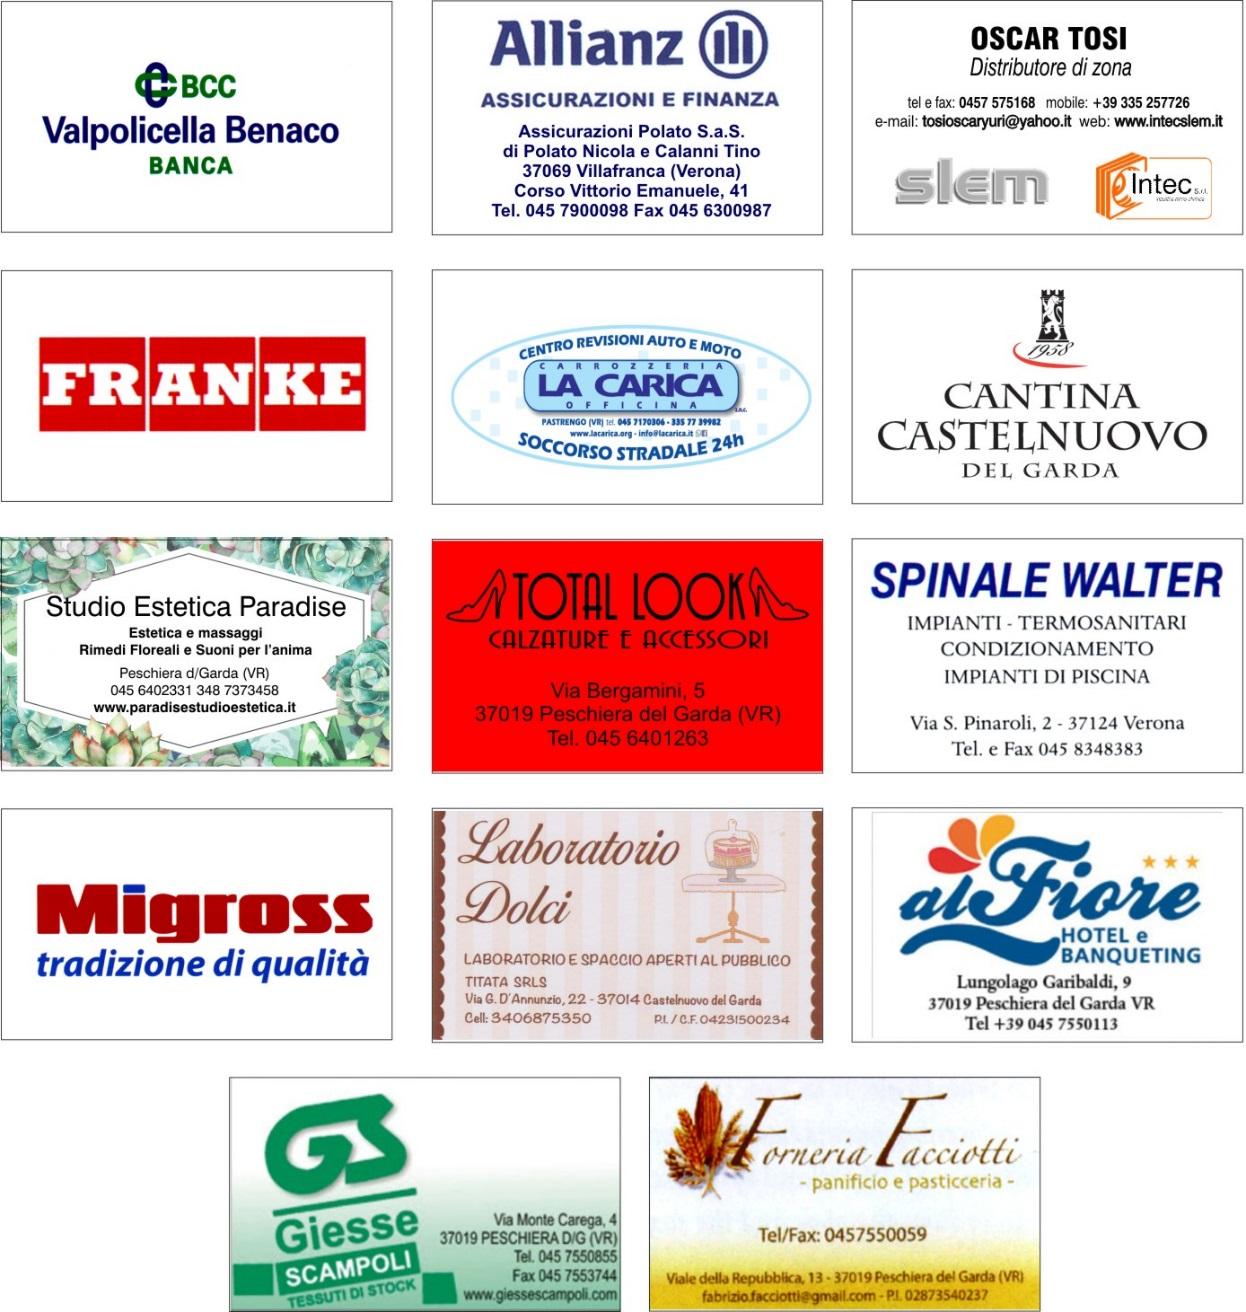 https://www.amicimusicalagodigarda.it/images/sponsor.jpg